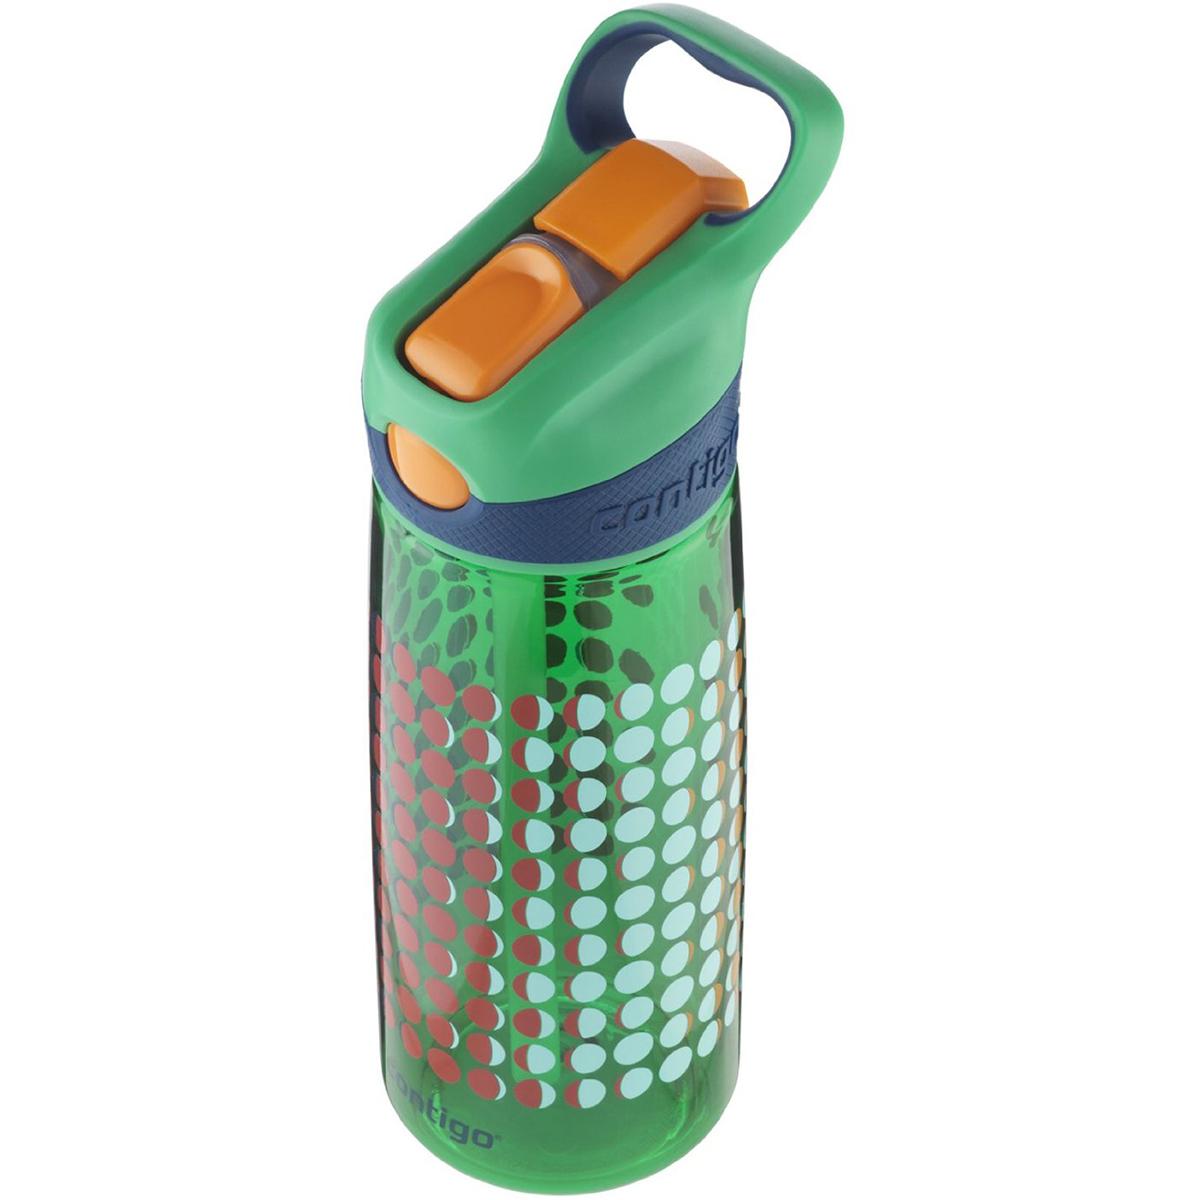 Contigo-20-oz-Kid-039-s-Striker-Autospout-Water-Bottle miniatuur 6